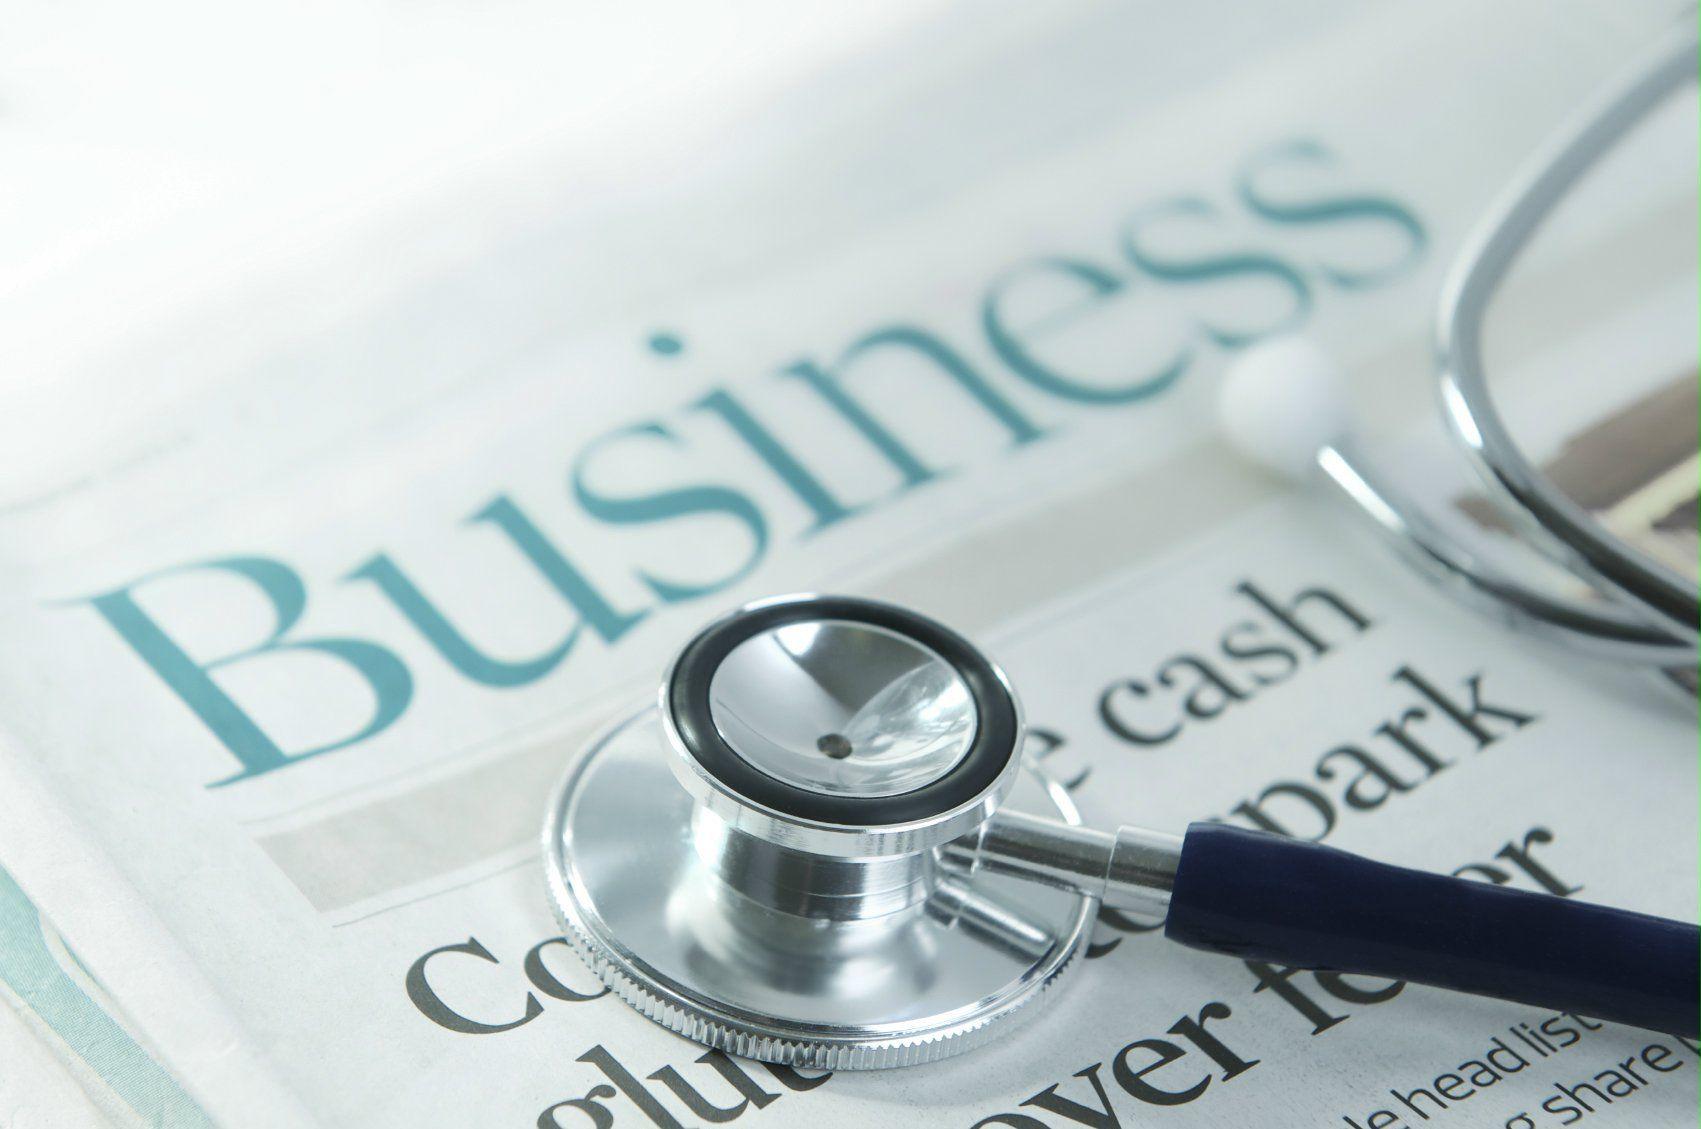 business-medicine-health-check-medical